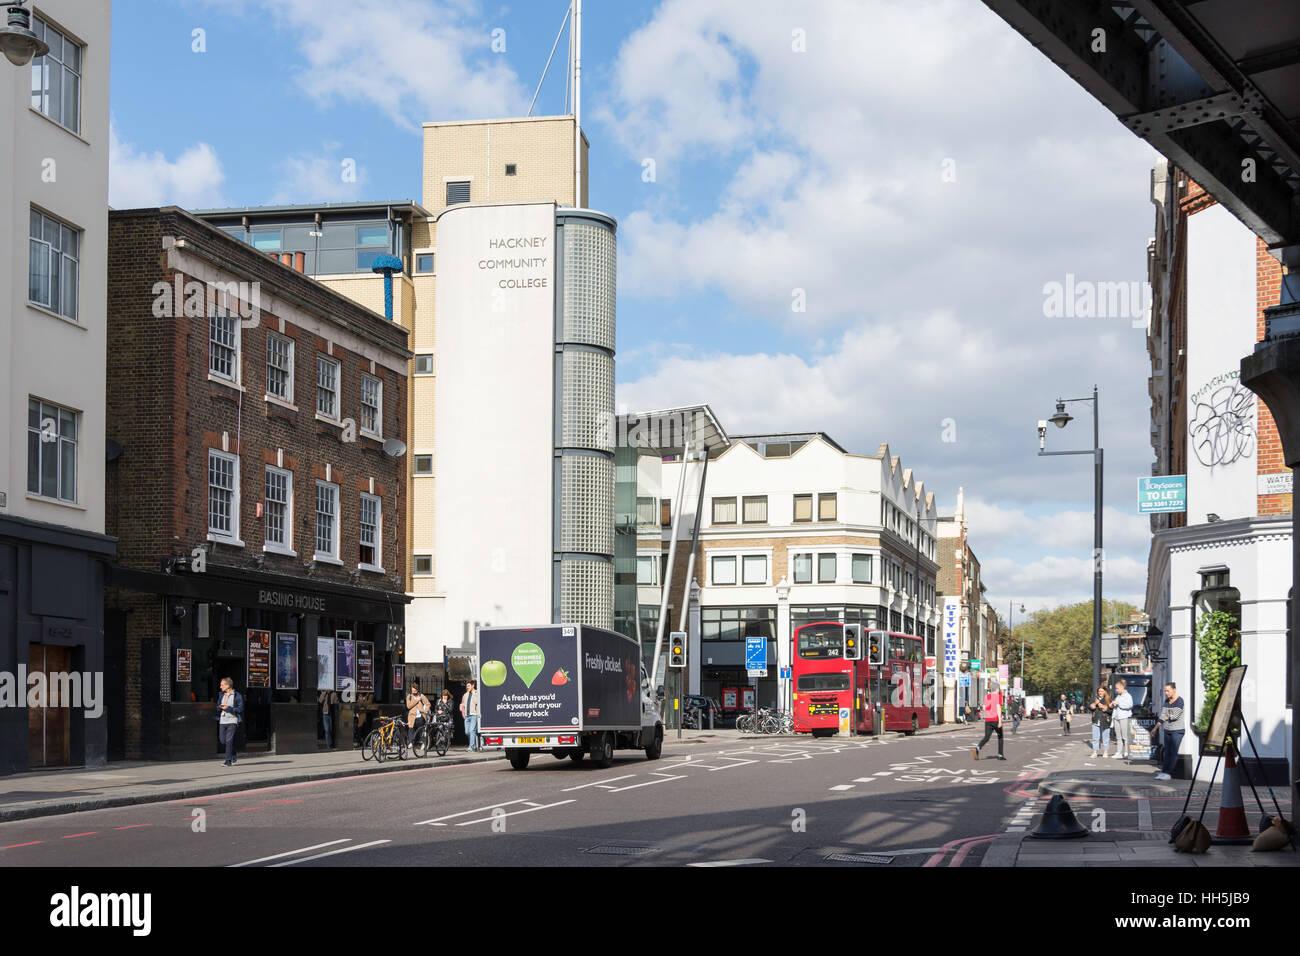 Shoreditch High Street, Shoreditch, London Borough of Hackney, Greater London, Angleterre, Royaume-Uni Photo Stock